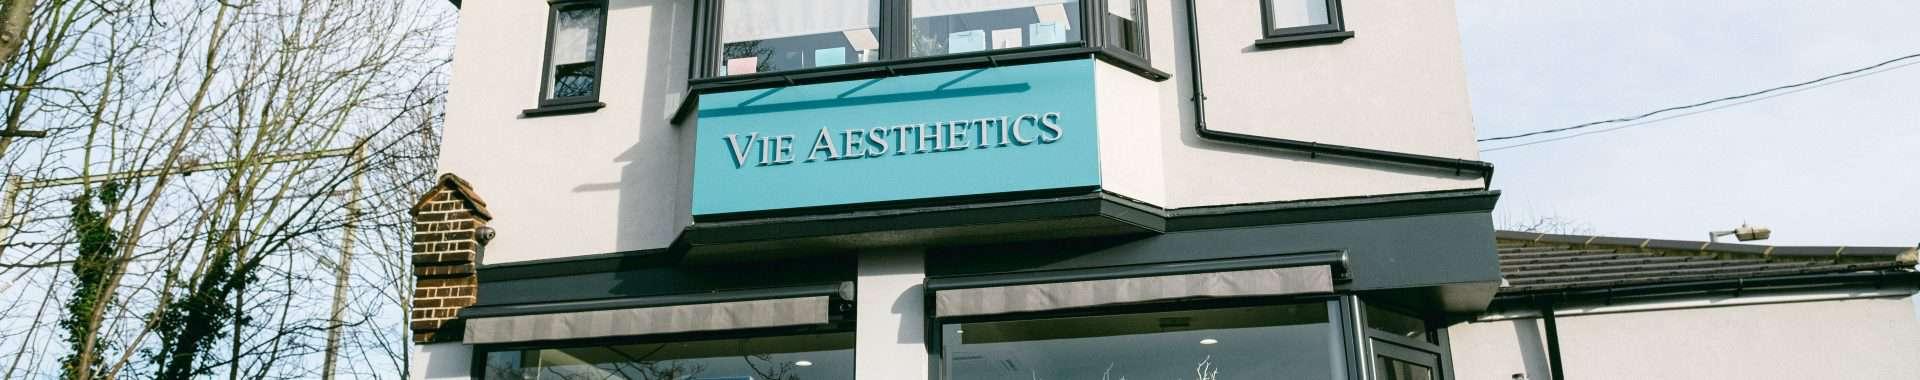 vie aesthetics general banner